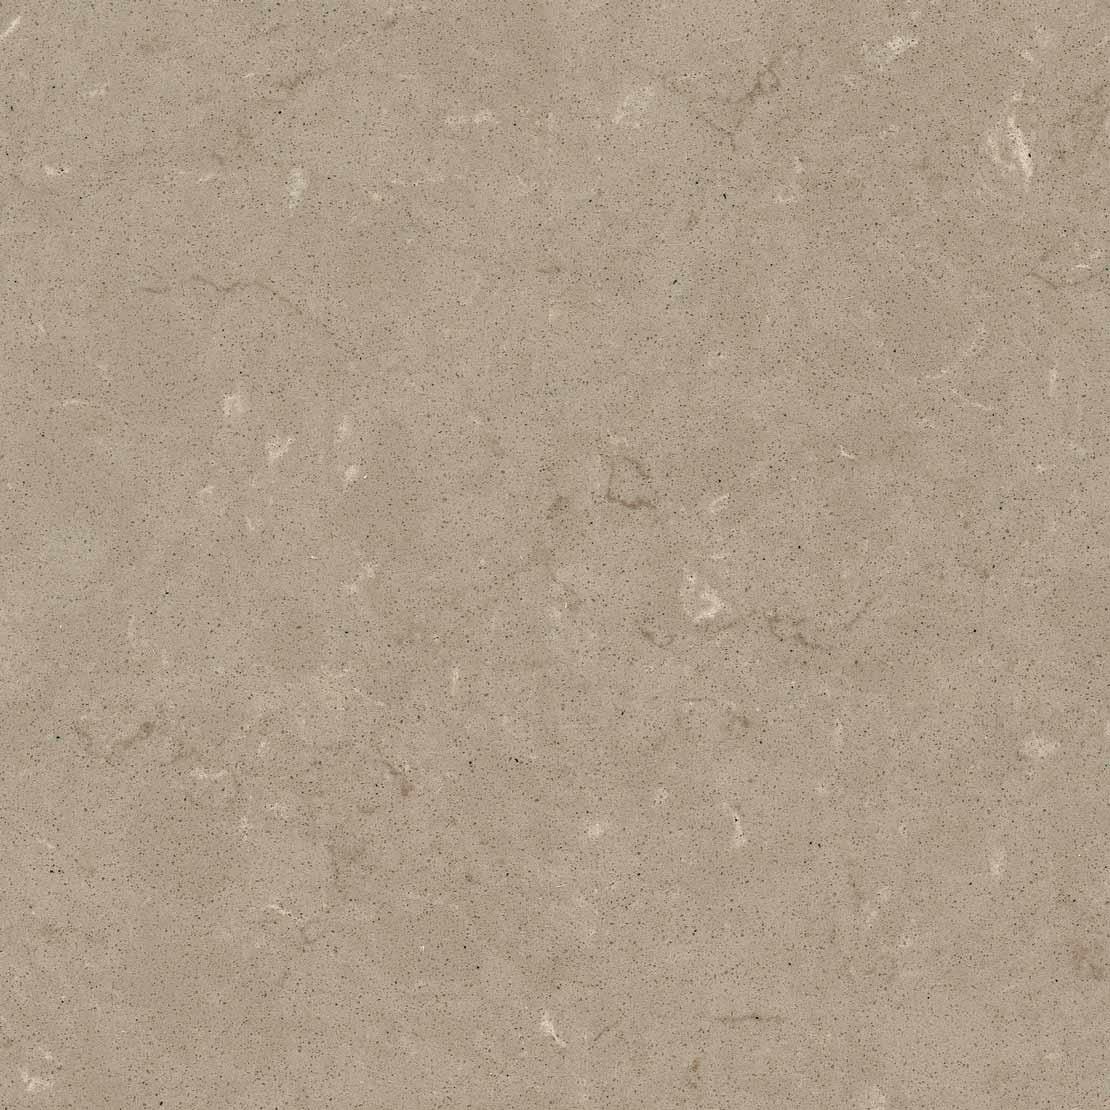 Blad Silestone Coral Clay